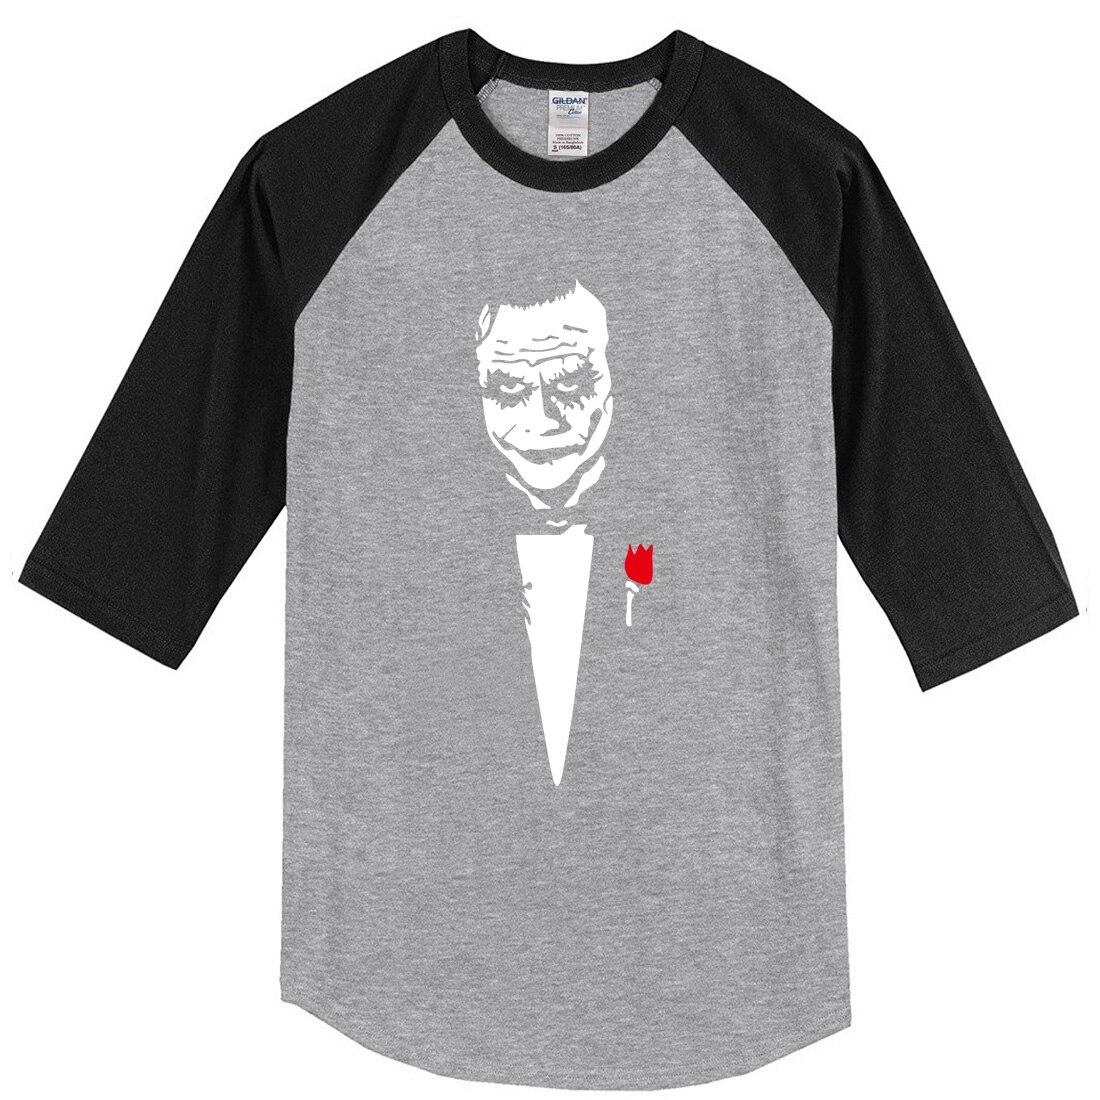 New Arrival 2018 Summer T-shirt For Men Joker Heath Ledger Why So Serious Cotton Raglan Tshirt Mens Sportswear Top T shirt Hot